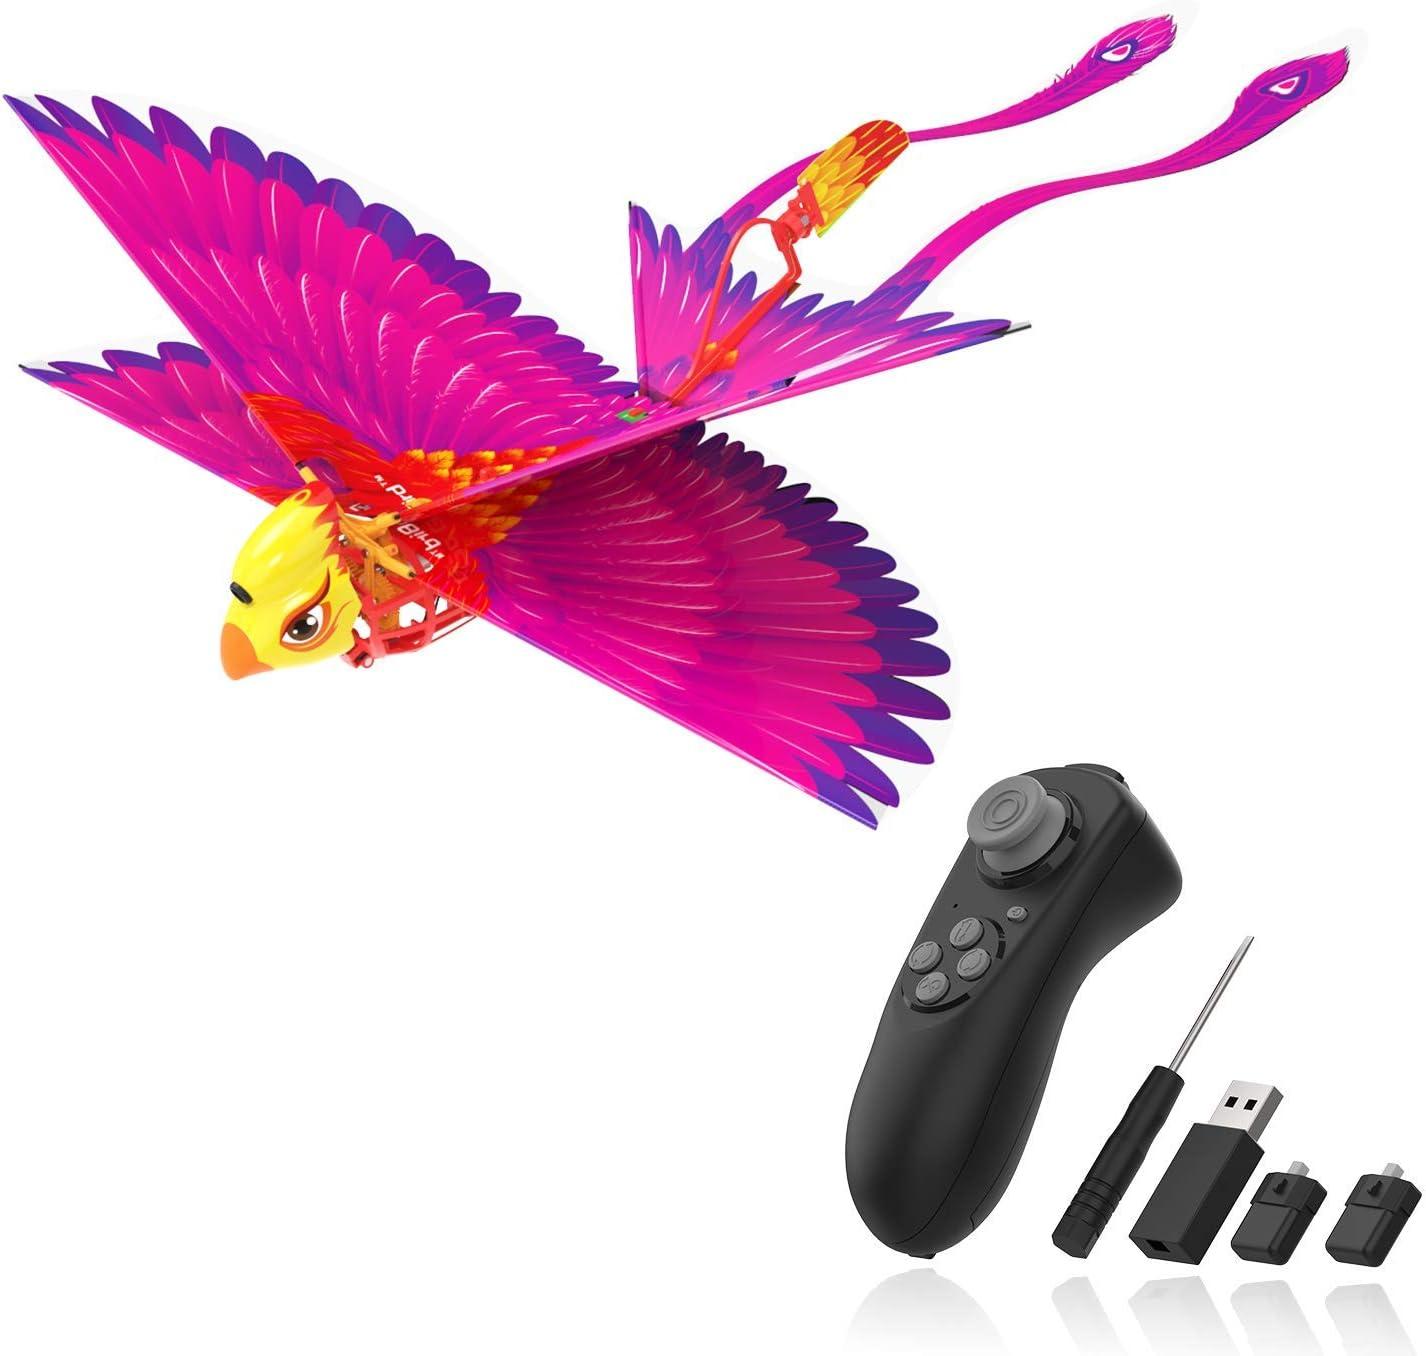 HANVON Go Bird Flying Superior Toy RC New item Mini Bio Helicopters